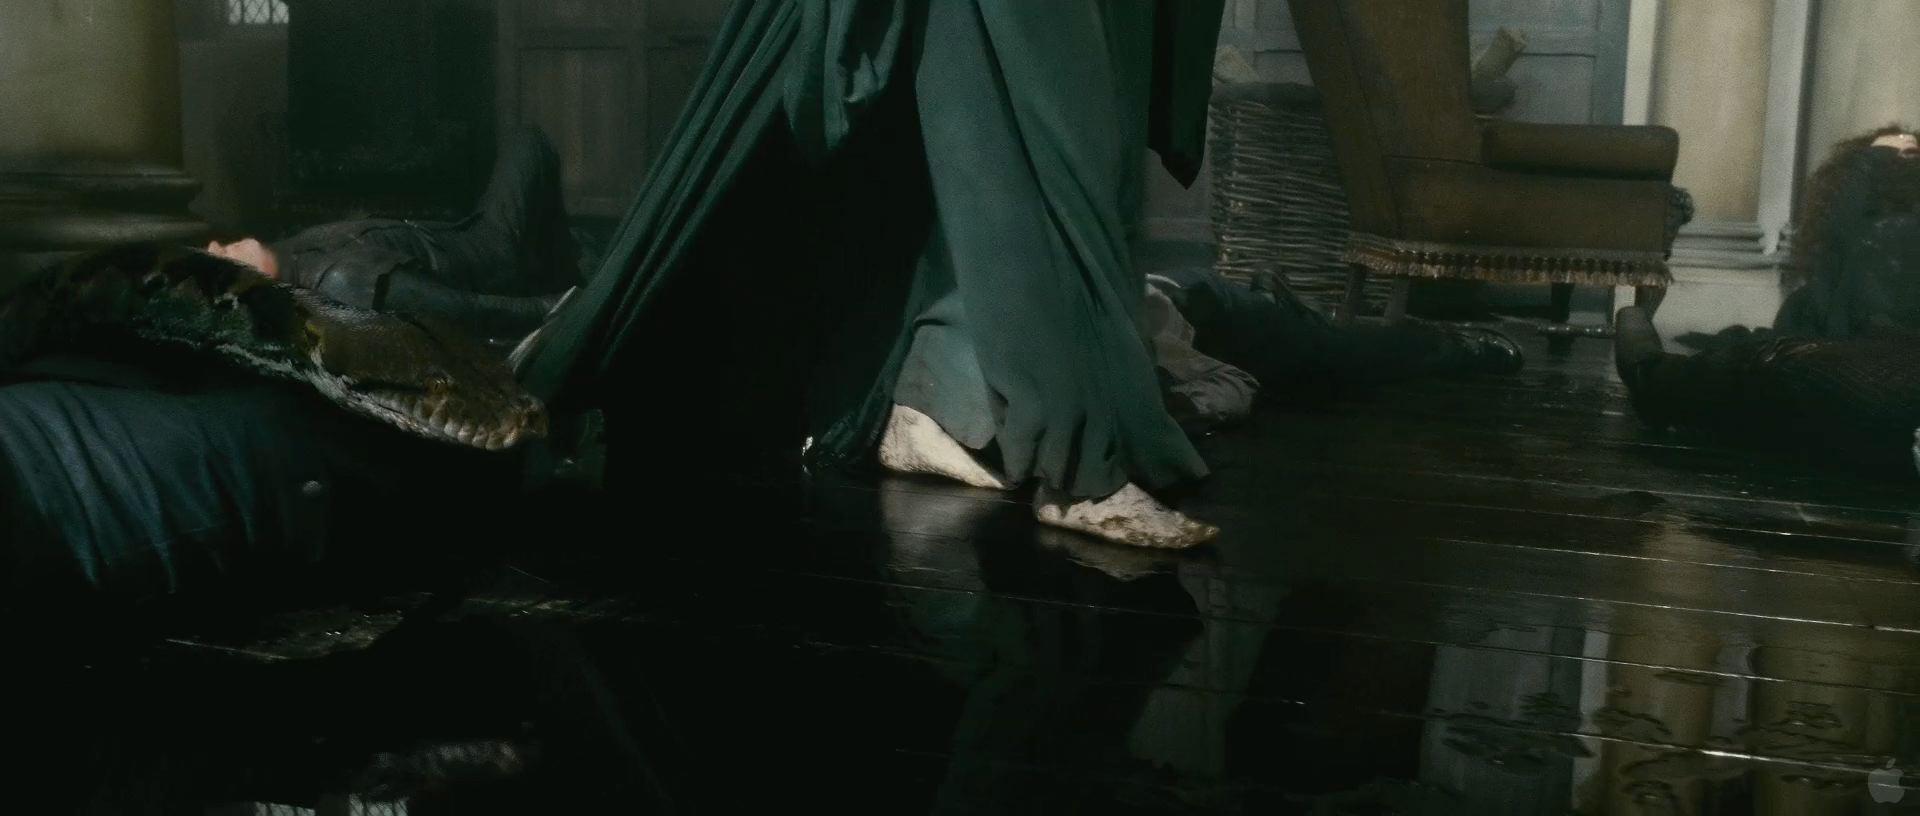 Harry Potter BlogHogwarts HP7 2 Trailer 17